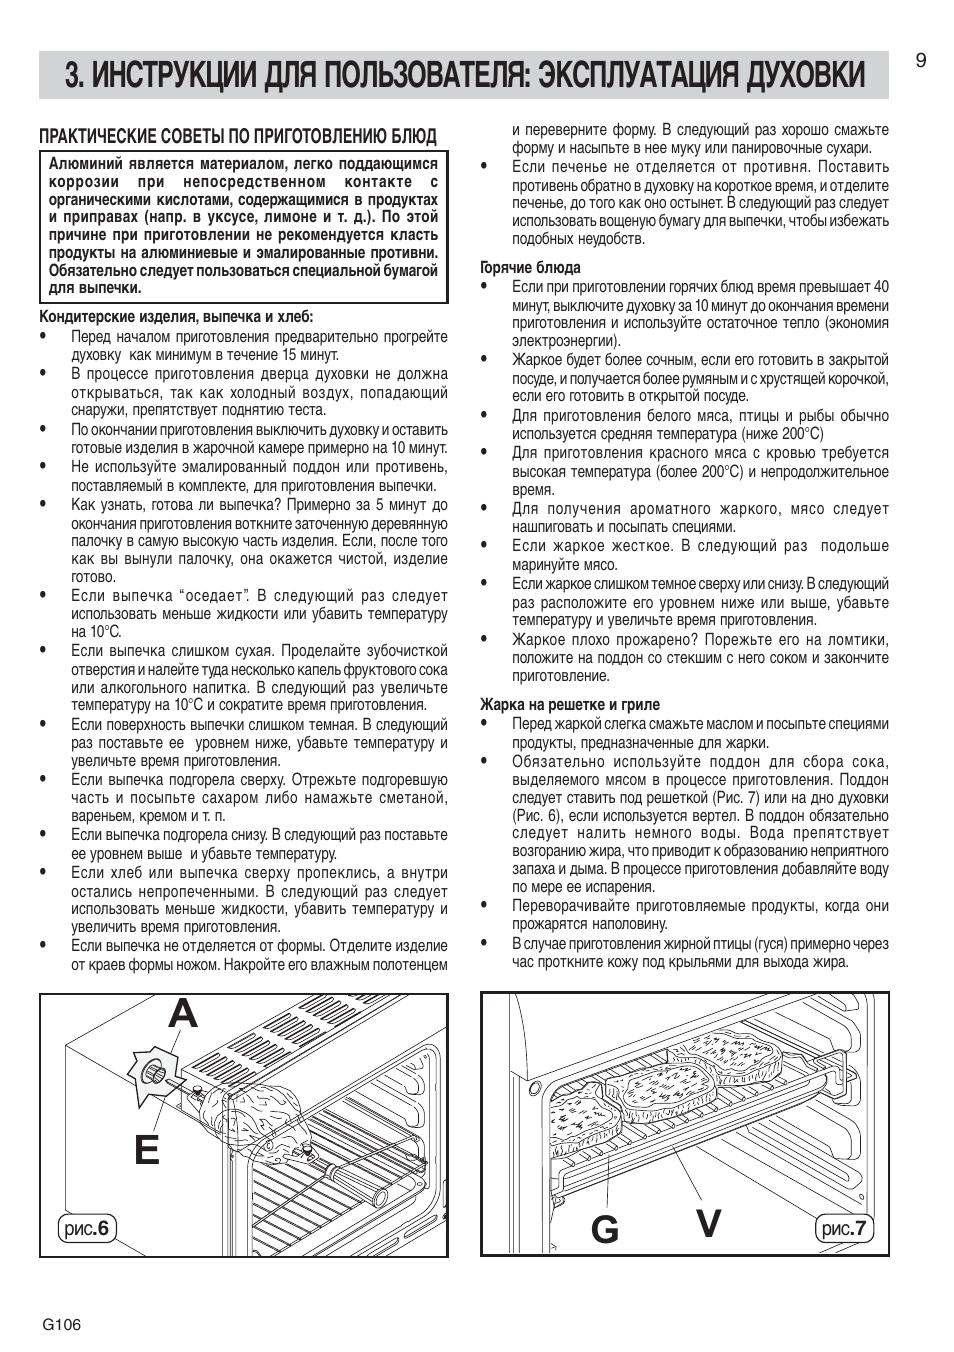 электроплита ардо инструкция по эксплуатации духовки